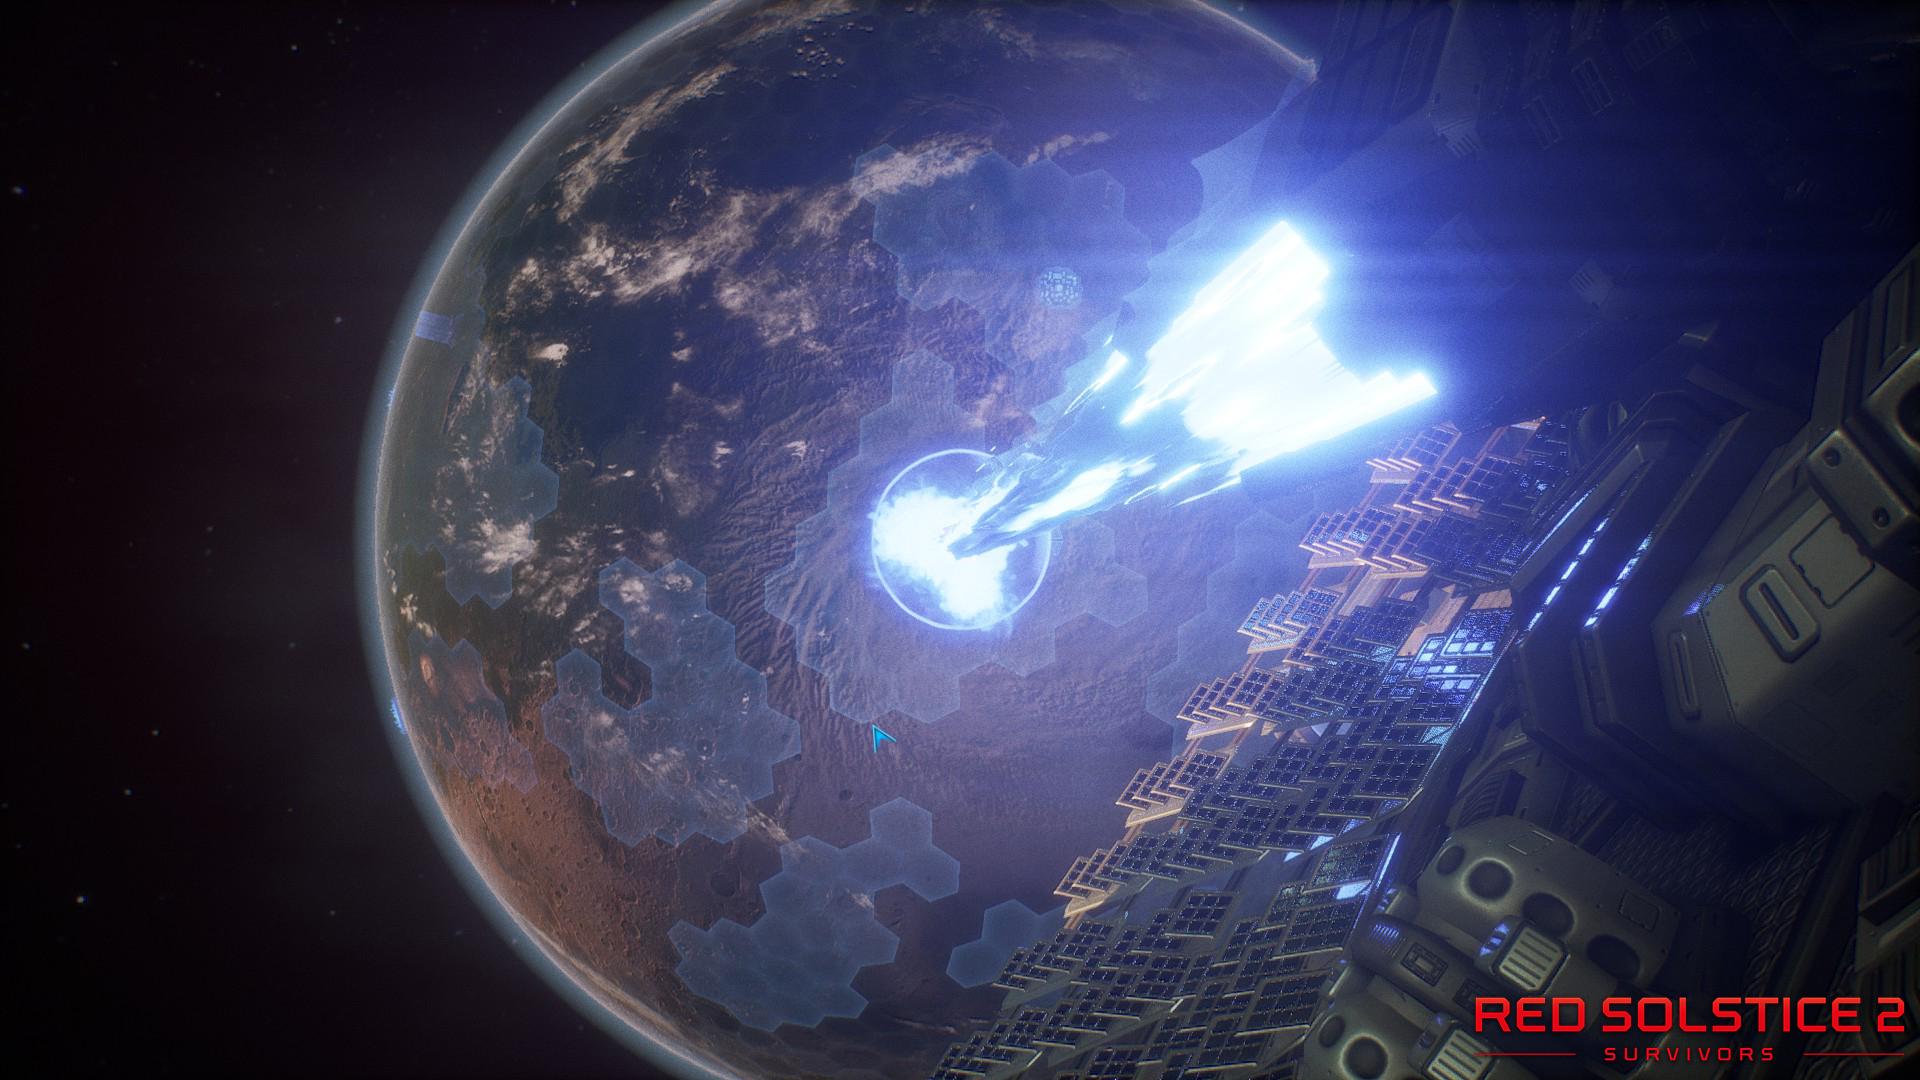 red-solstice-2-1